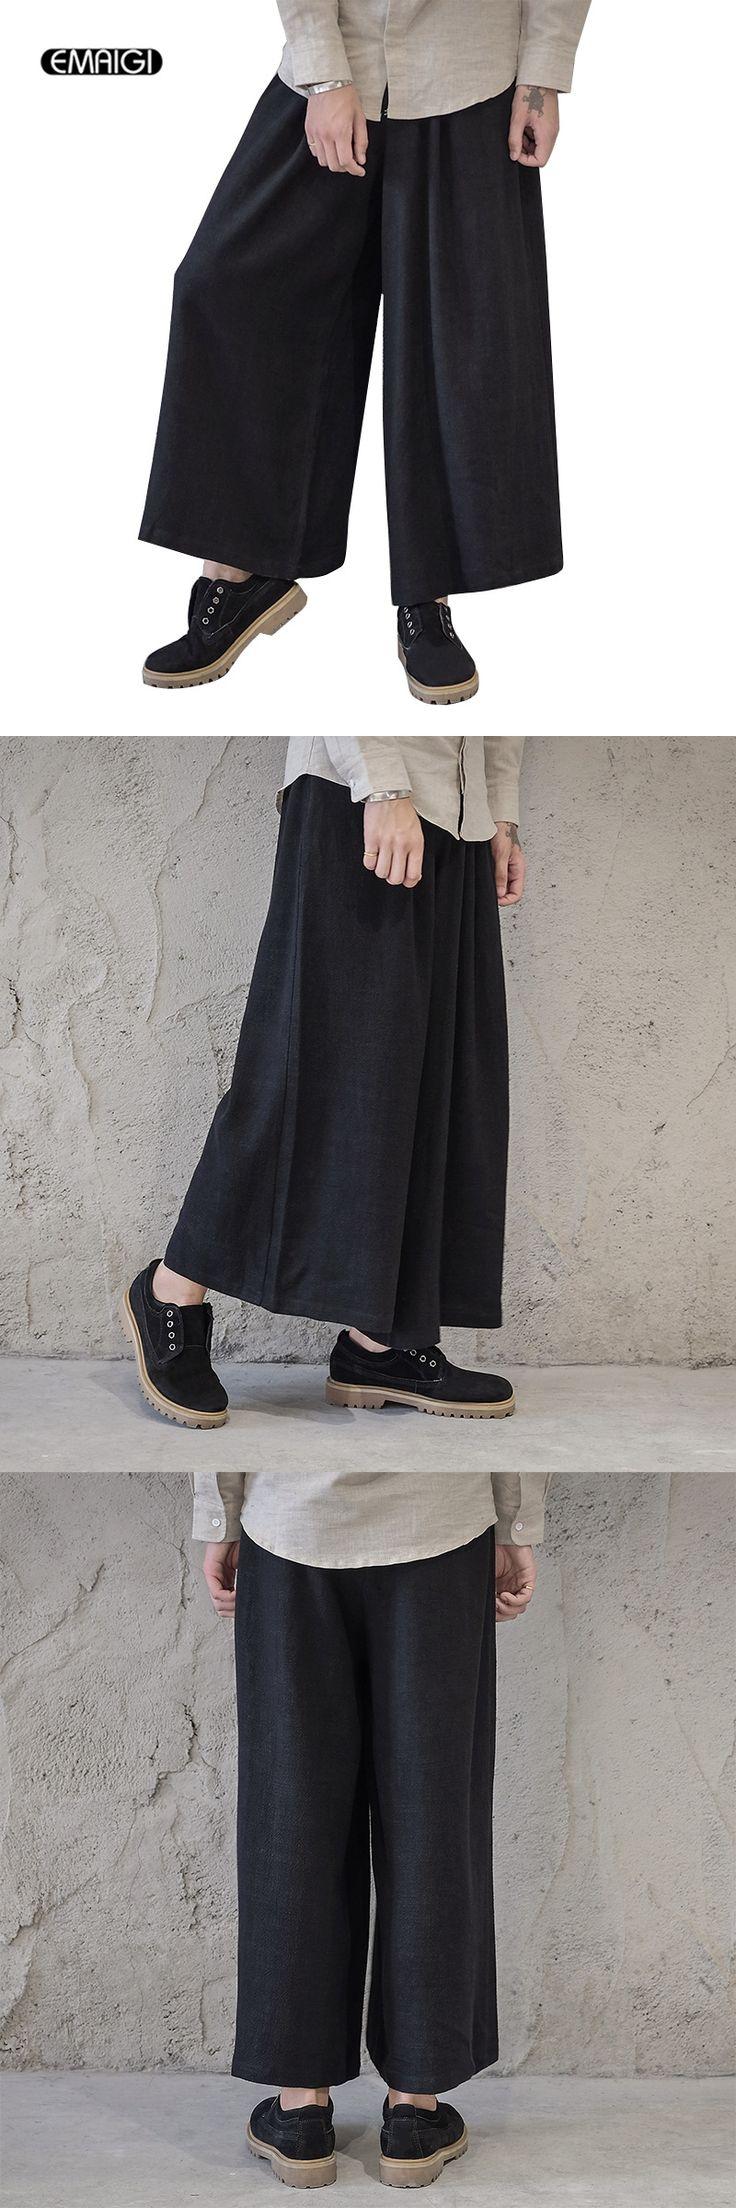 Men Wide Leg Trousers Linen Male Fashion Casual Harem Pant Japan Style Comfortable Skirt Pant